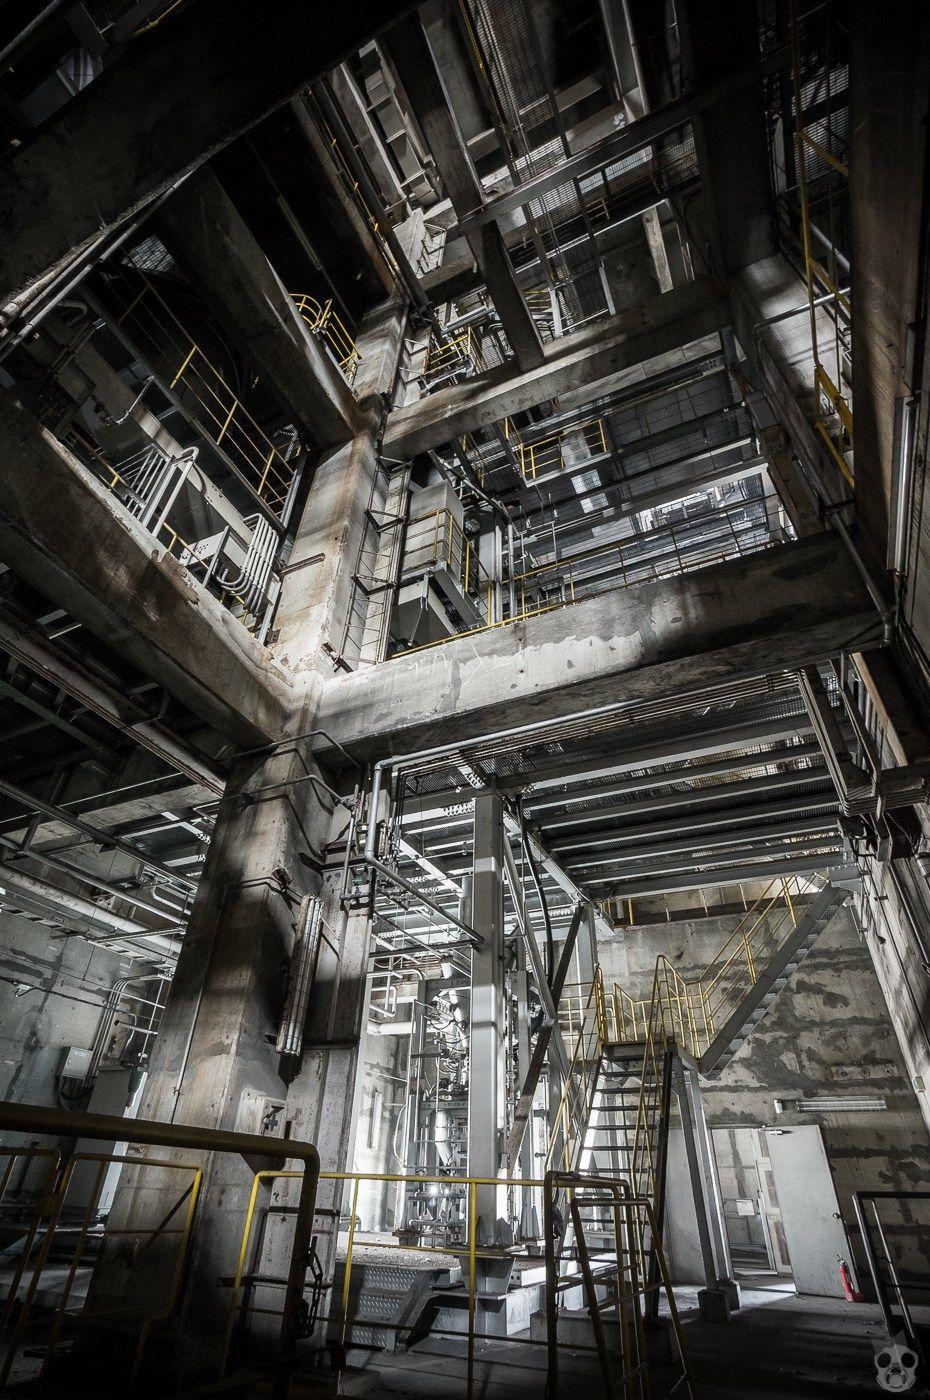 abandoned factory 巨大廃工場 廃墟 | ruins | pinterest | 廃墟、工場